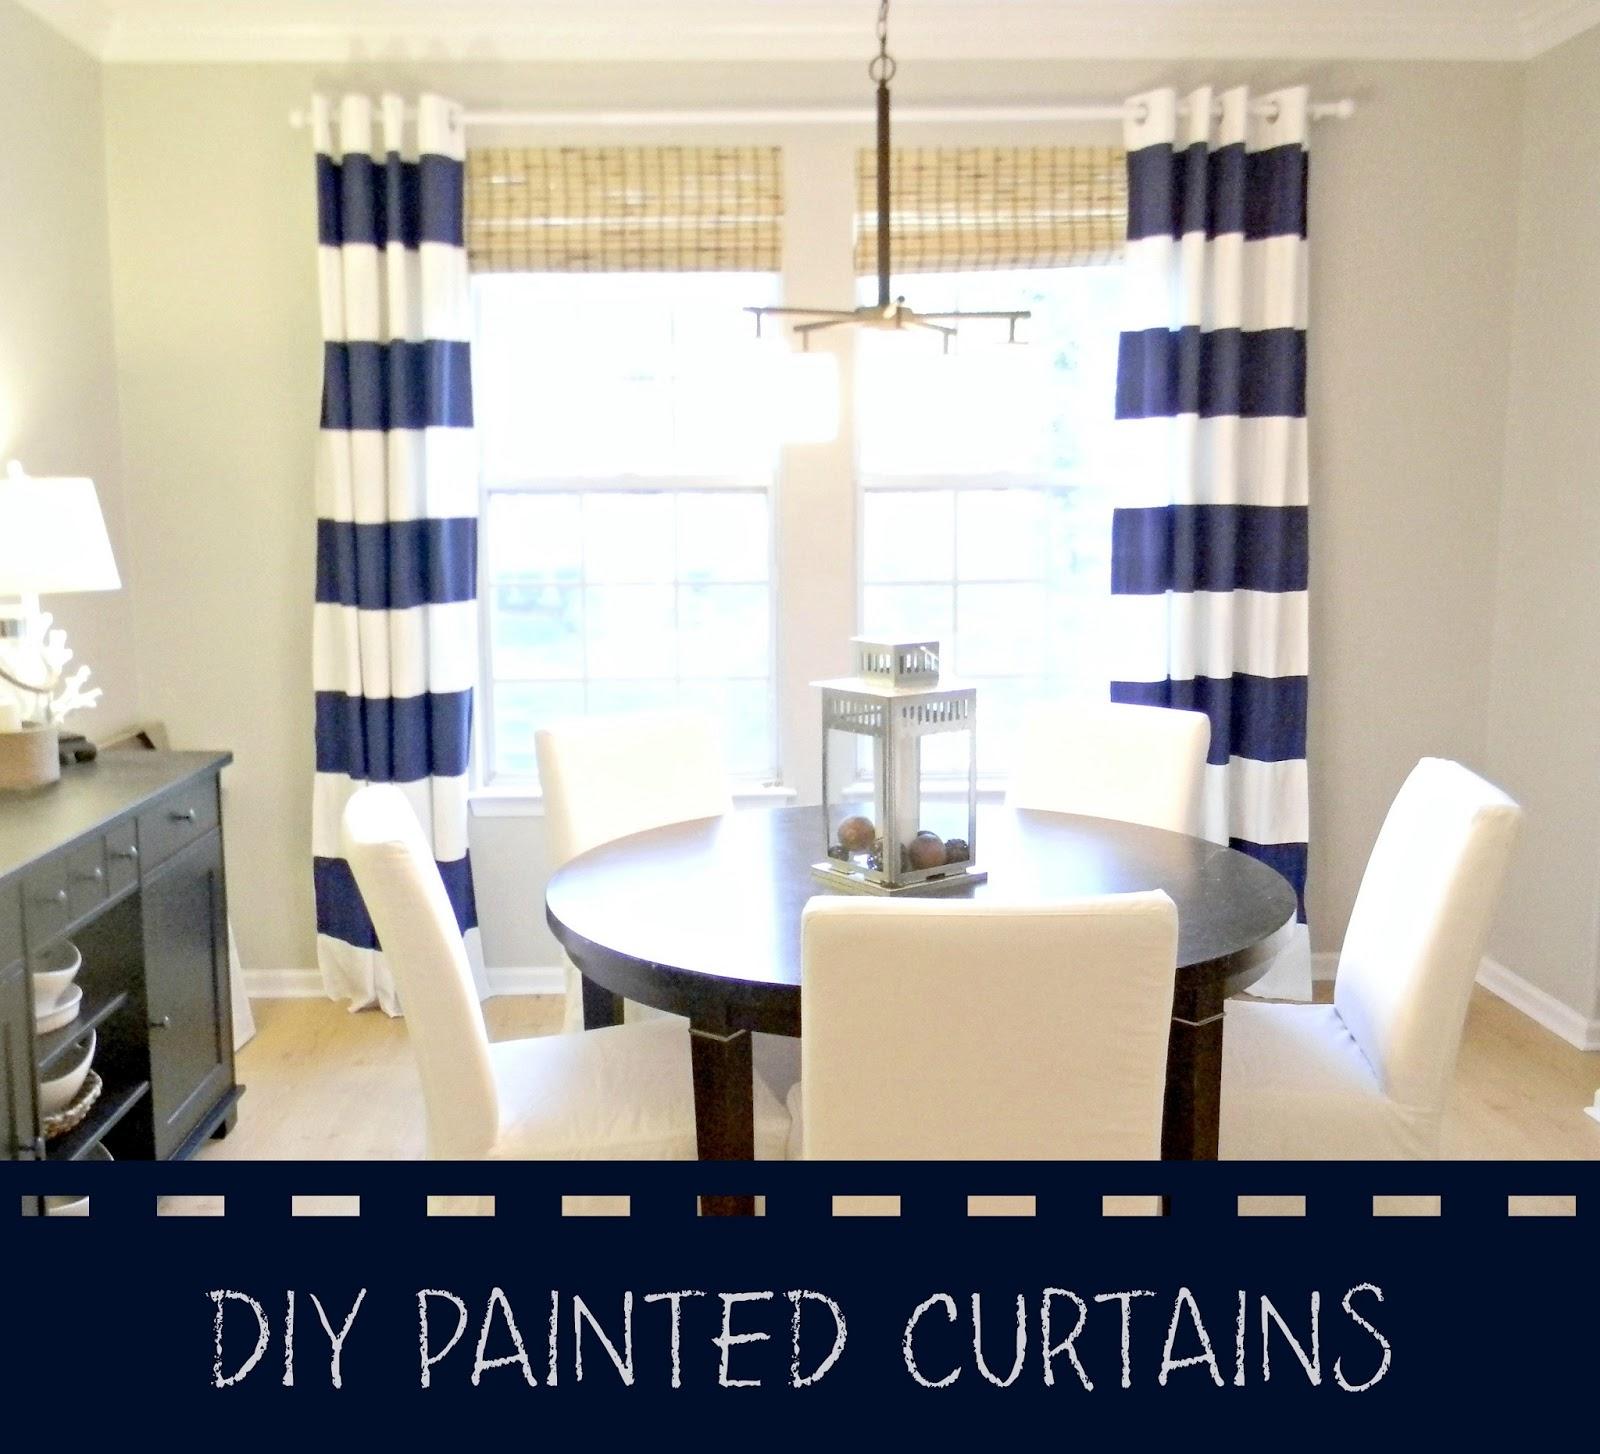 Seaside Interiors: DIY Navy Painted Curtains